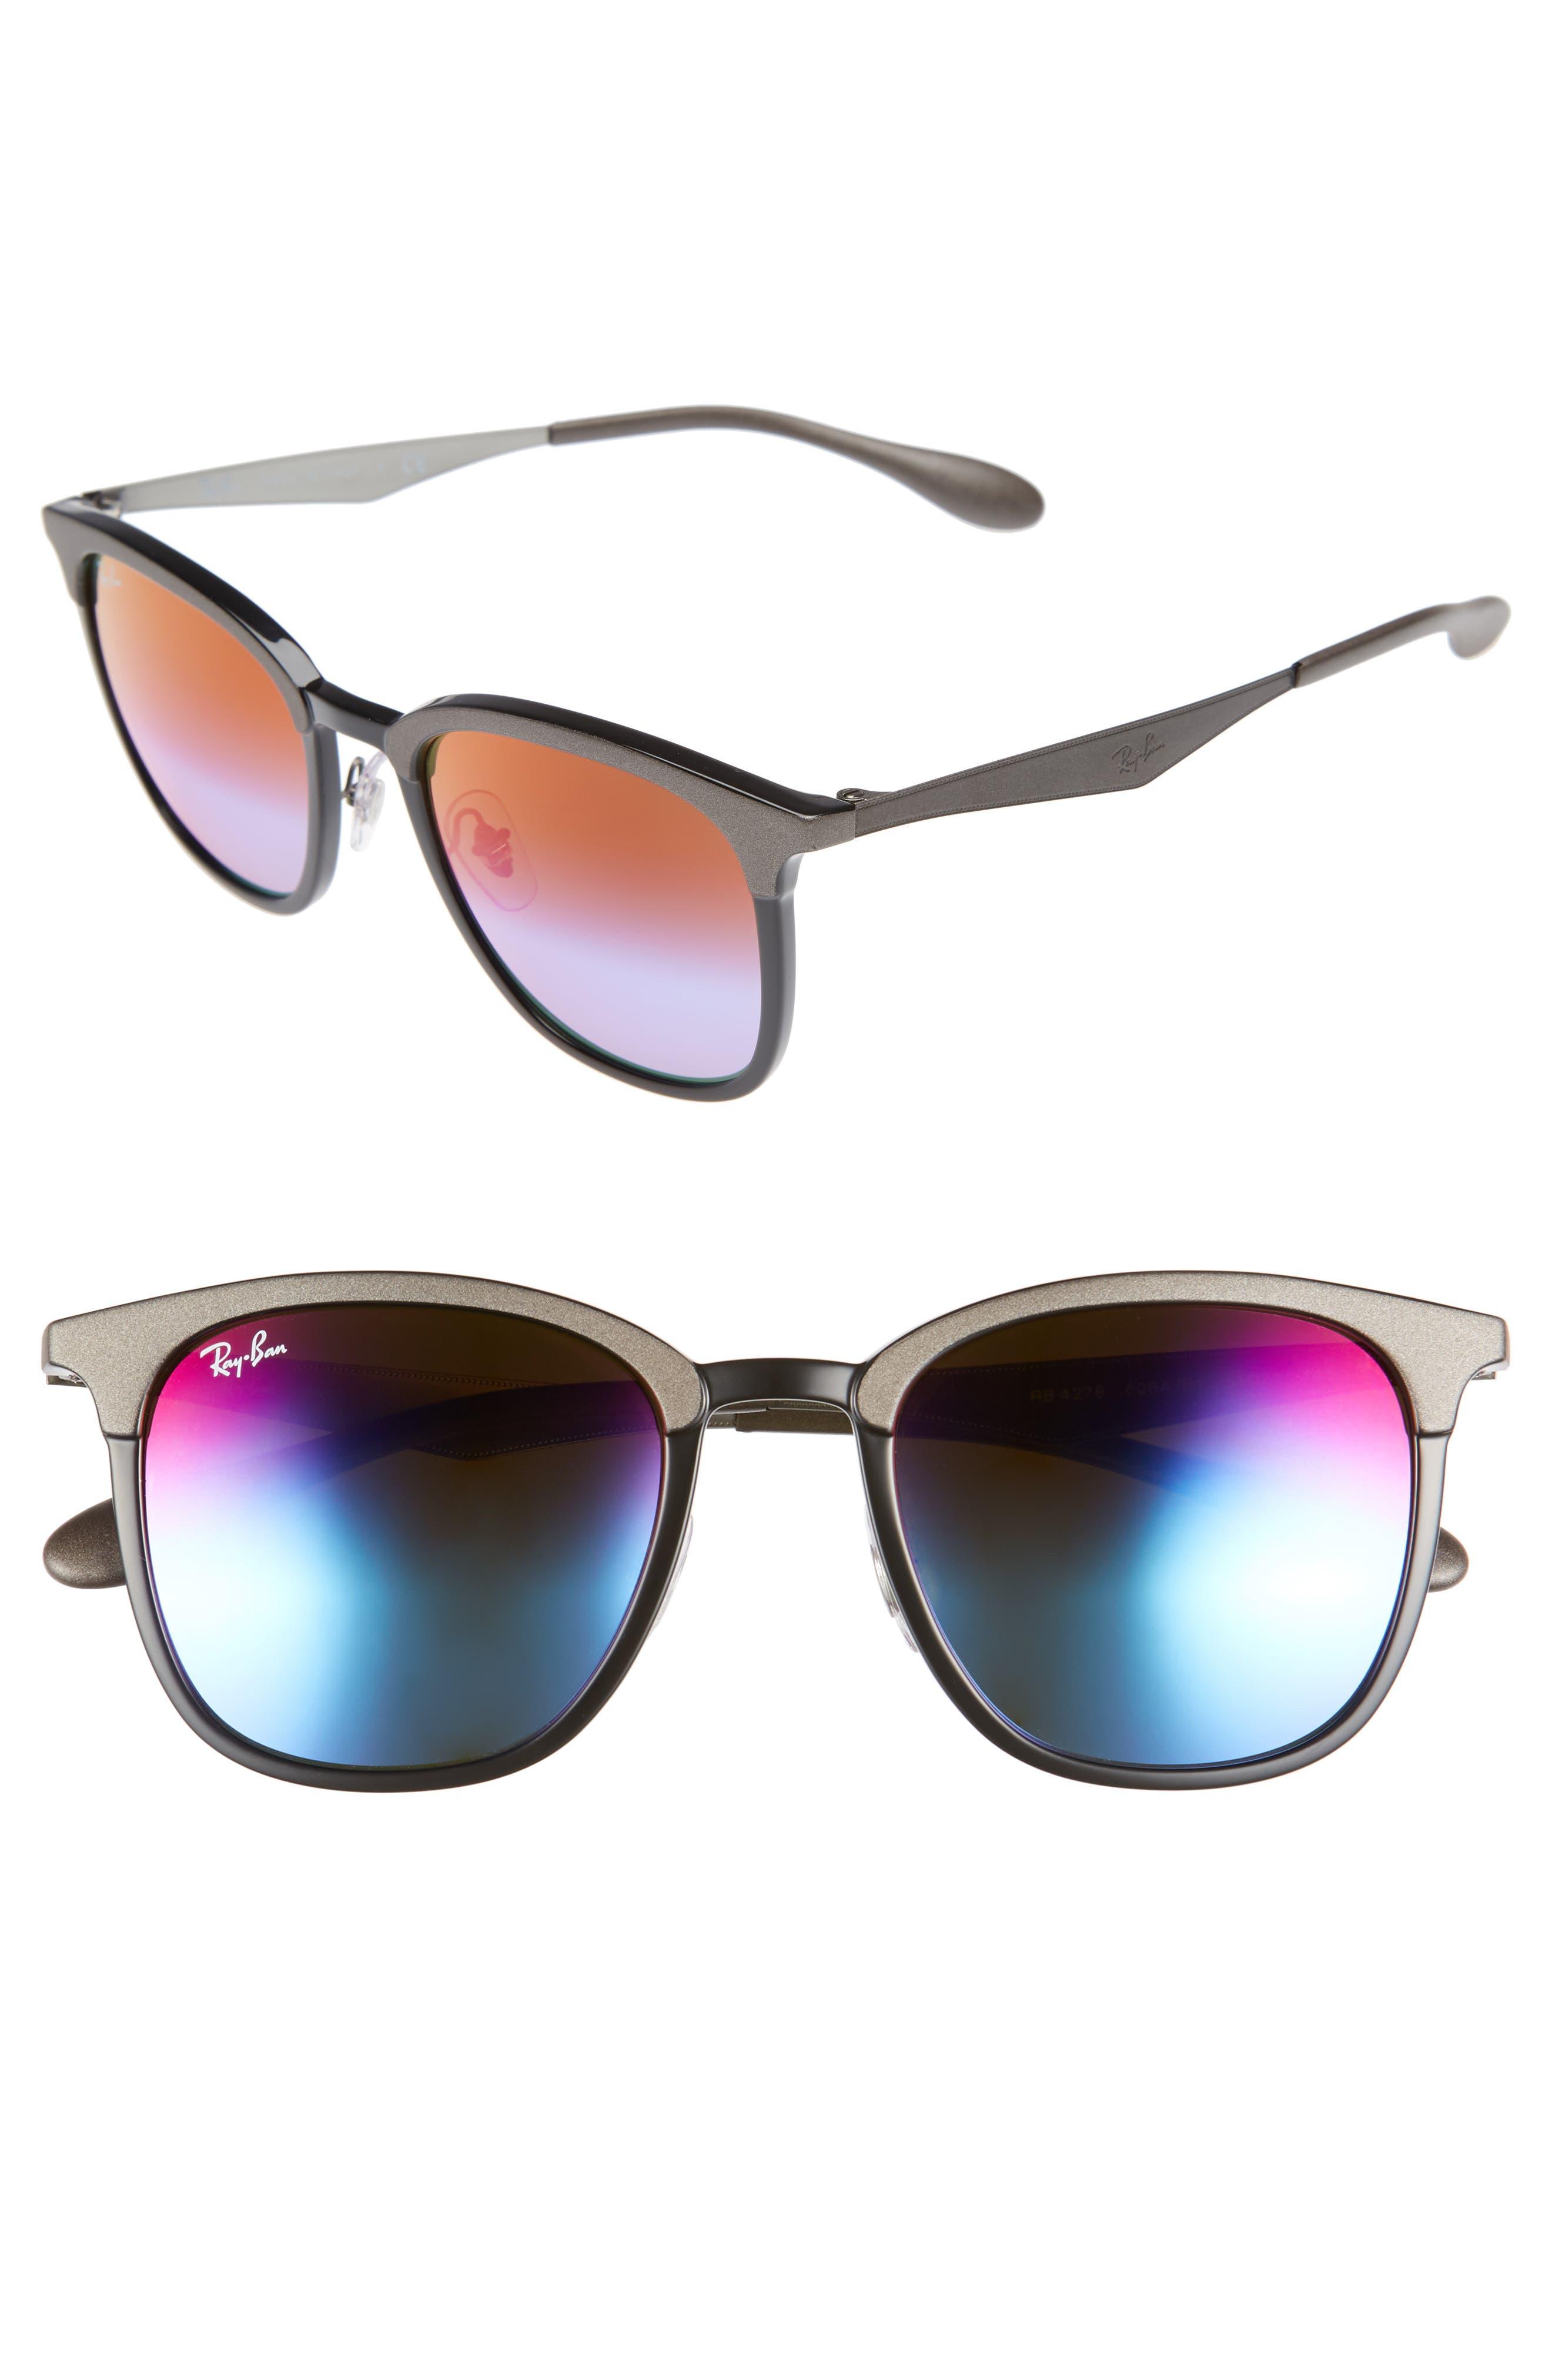 Main Image - Ray-Ban Highstreet 51mm Sunglasses